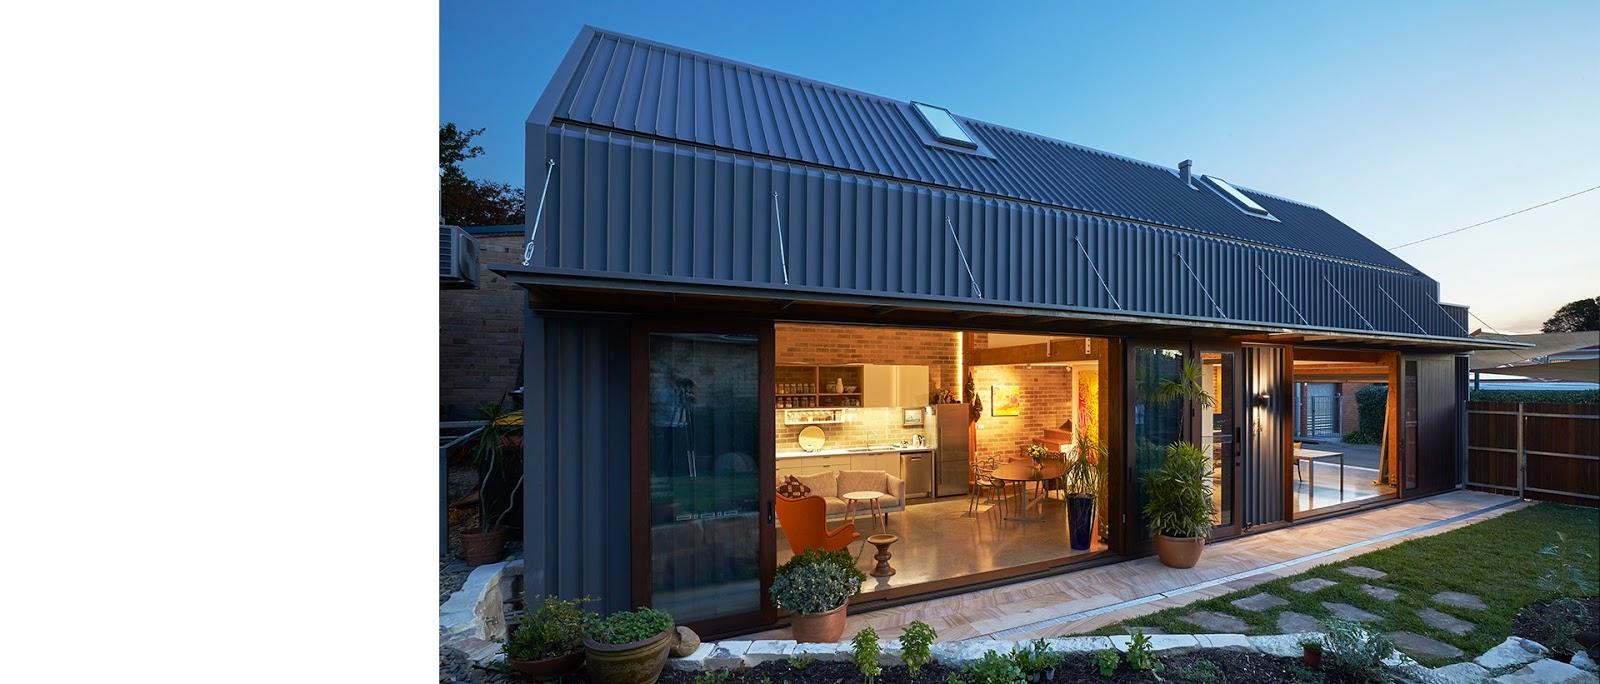 The Shed - Rumah Minimalis Satu Lantai Dengan Mezzanine